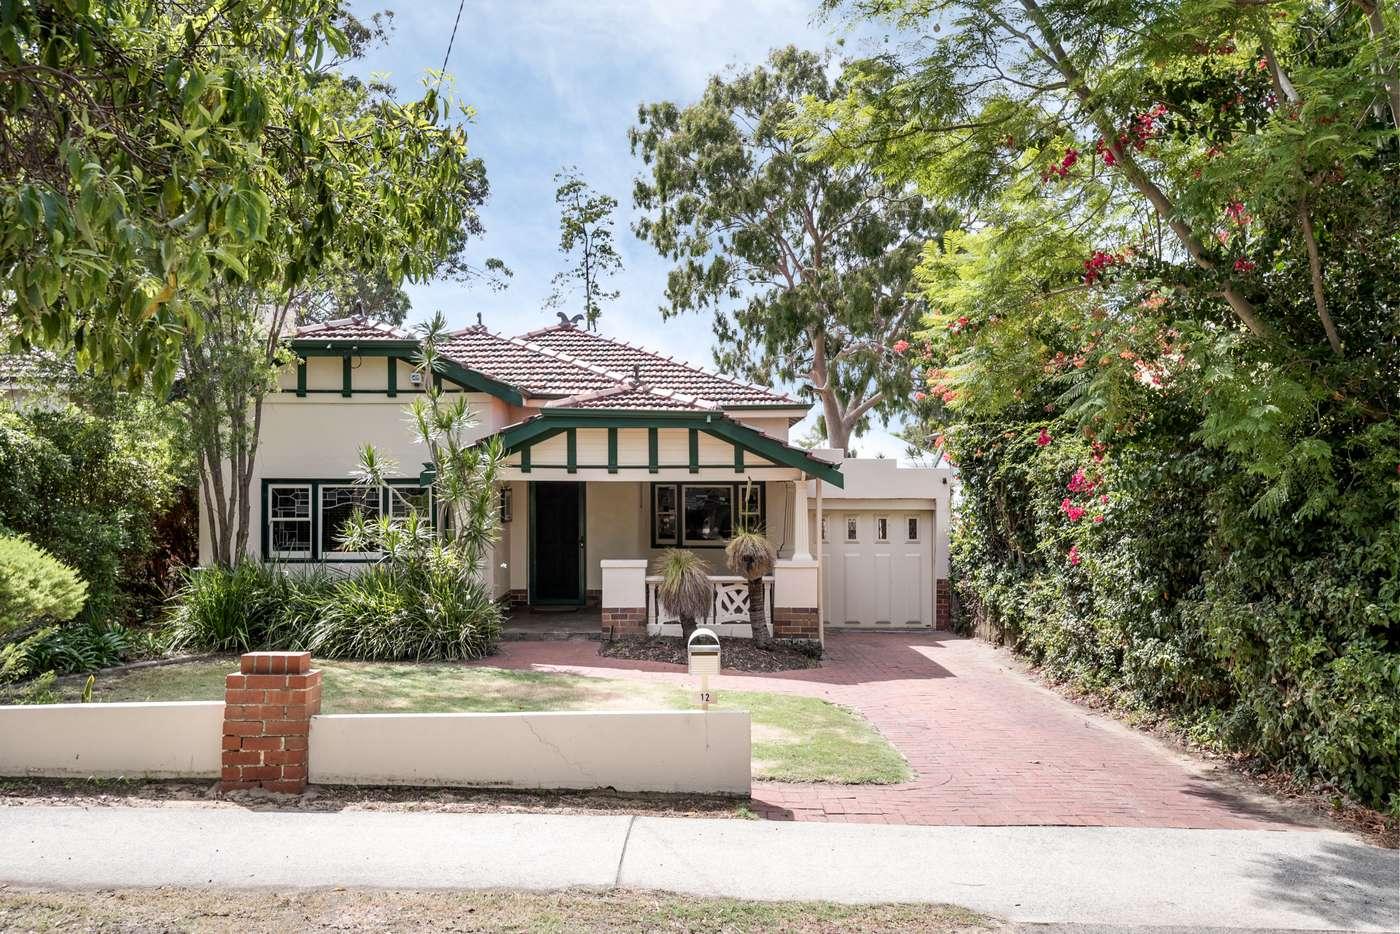 Main view of Homely house listing, 12 Meriwa Street, Nedlands WA 6009